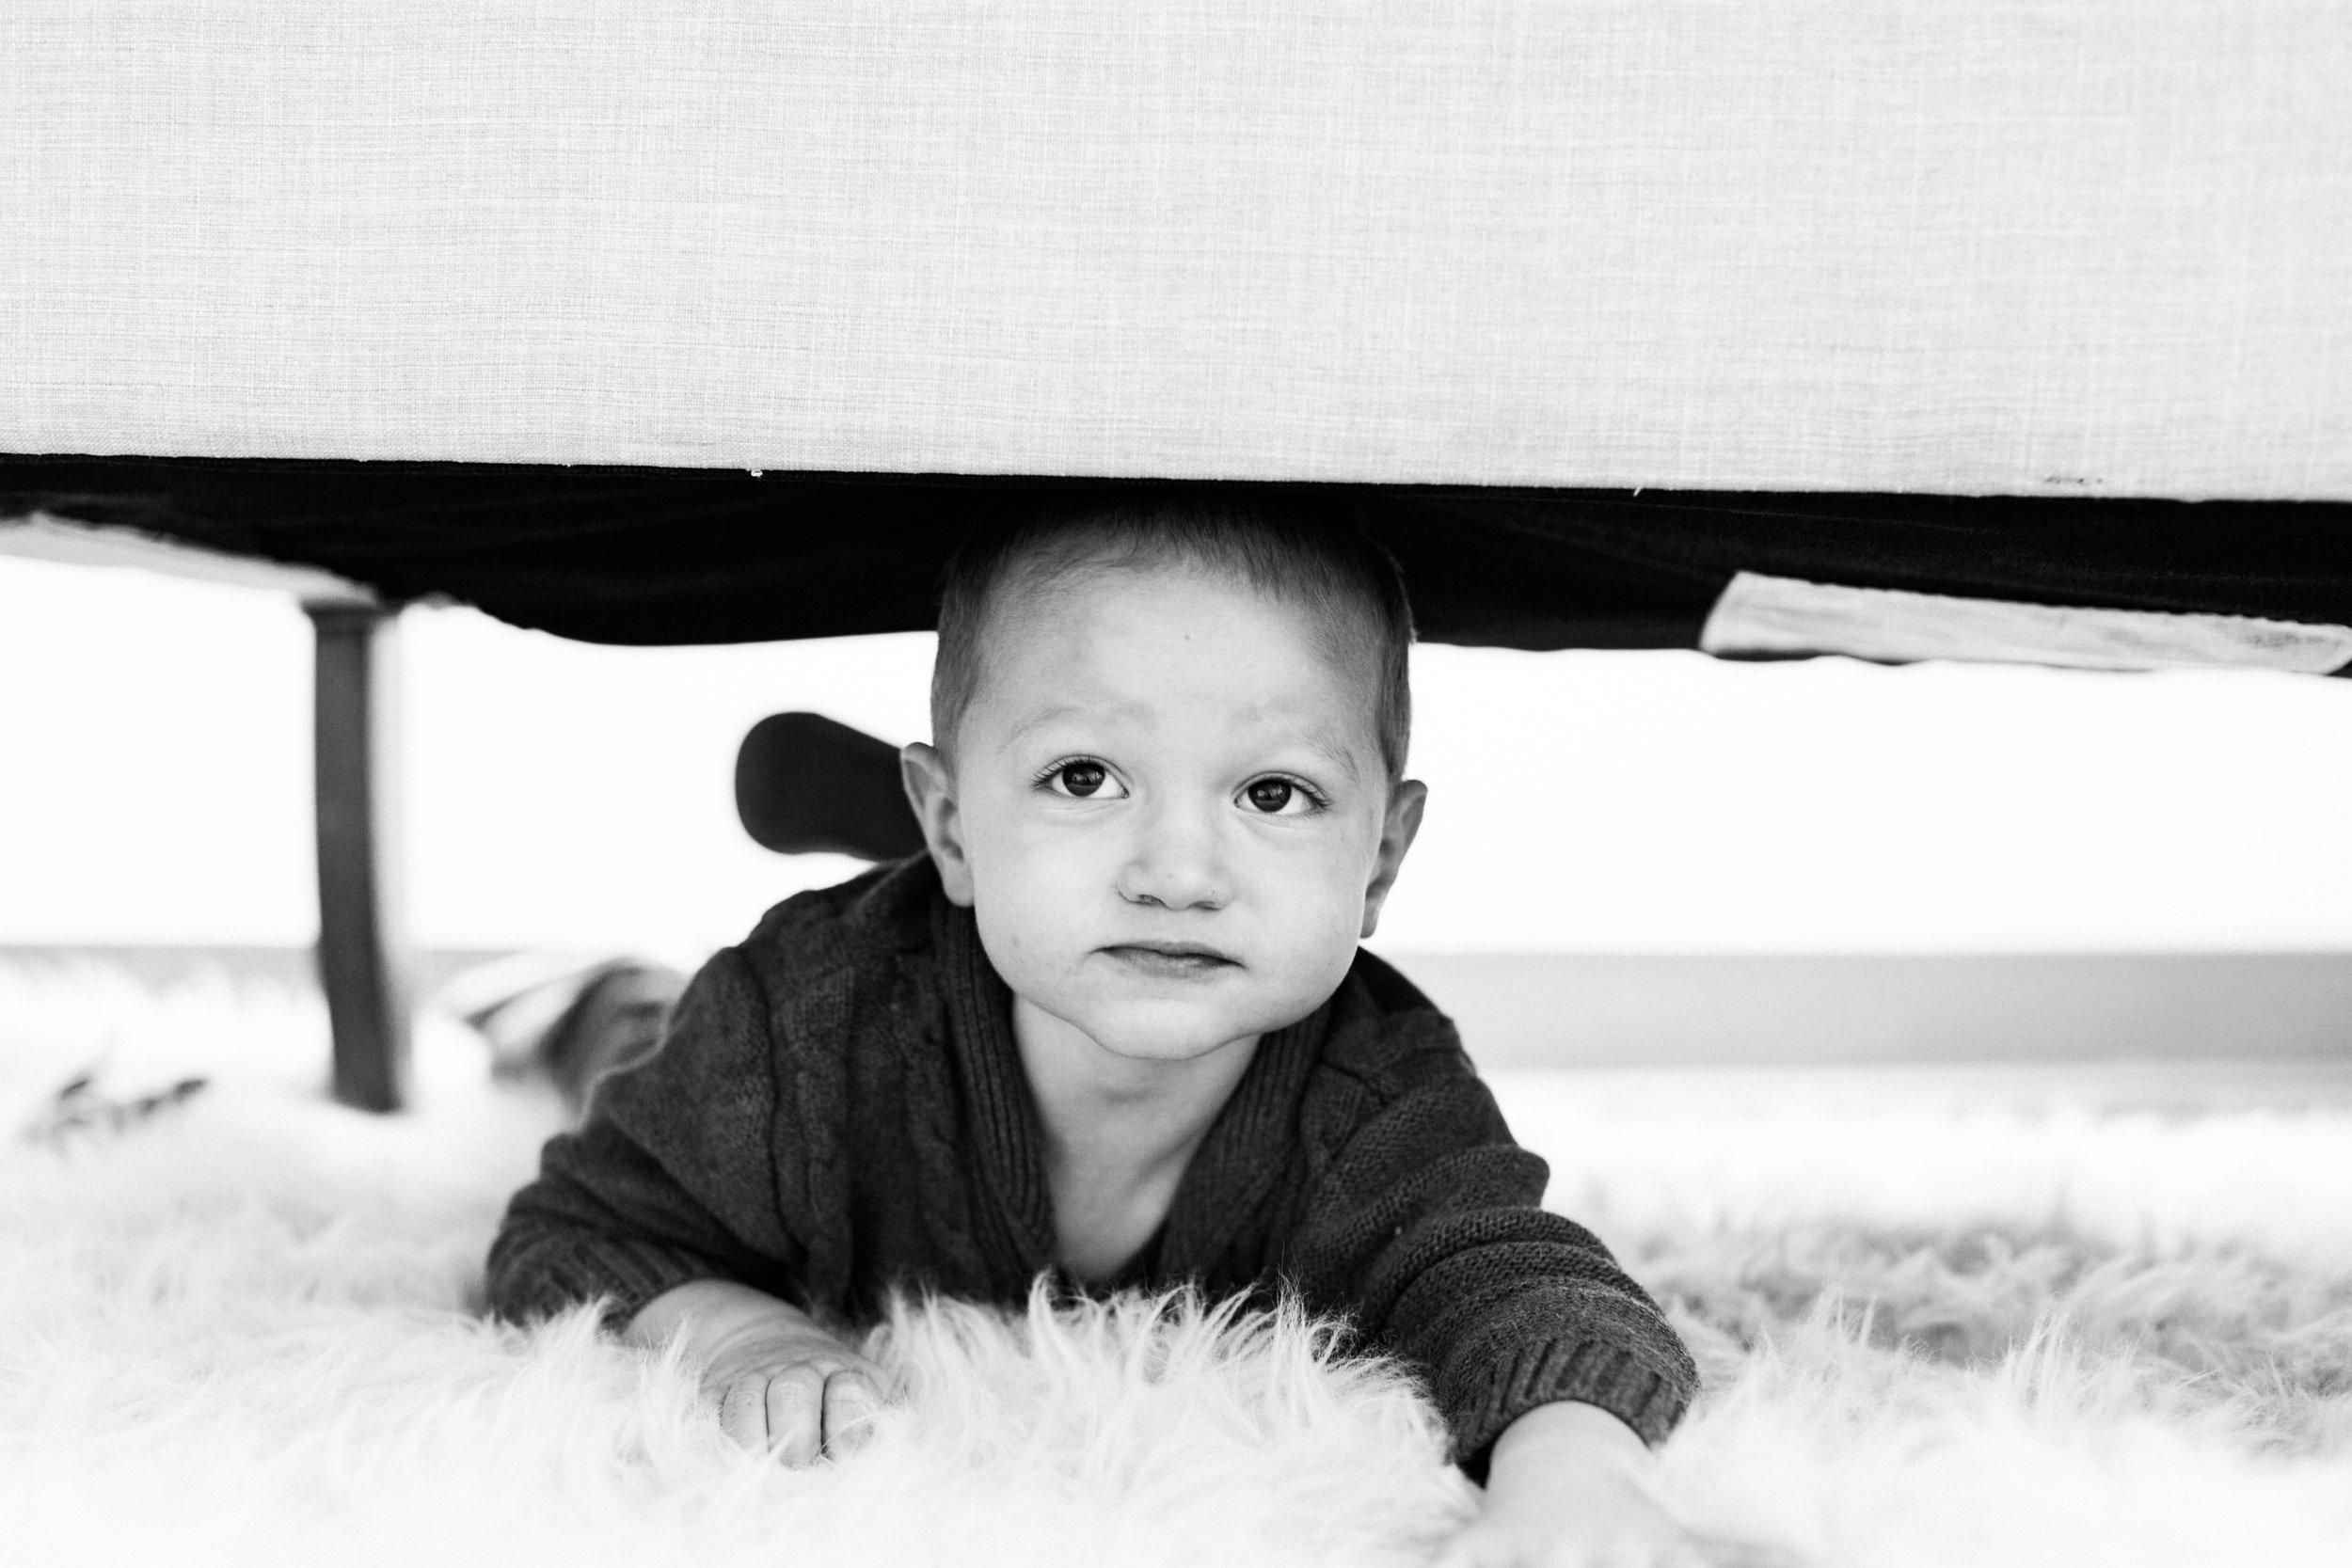 pittsburgh-newborn-family-photographer-Steven-Dray-family-anna-laero-photography-10.jpg